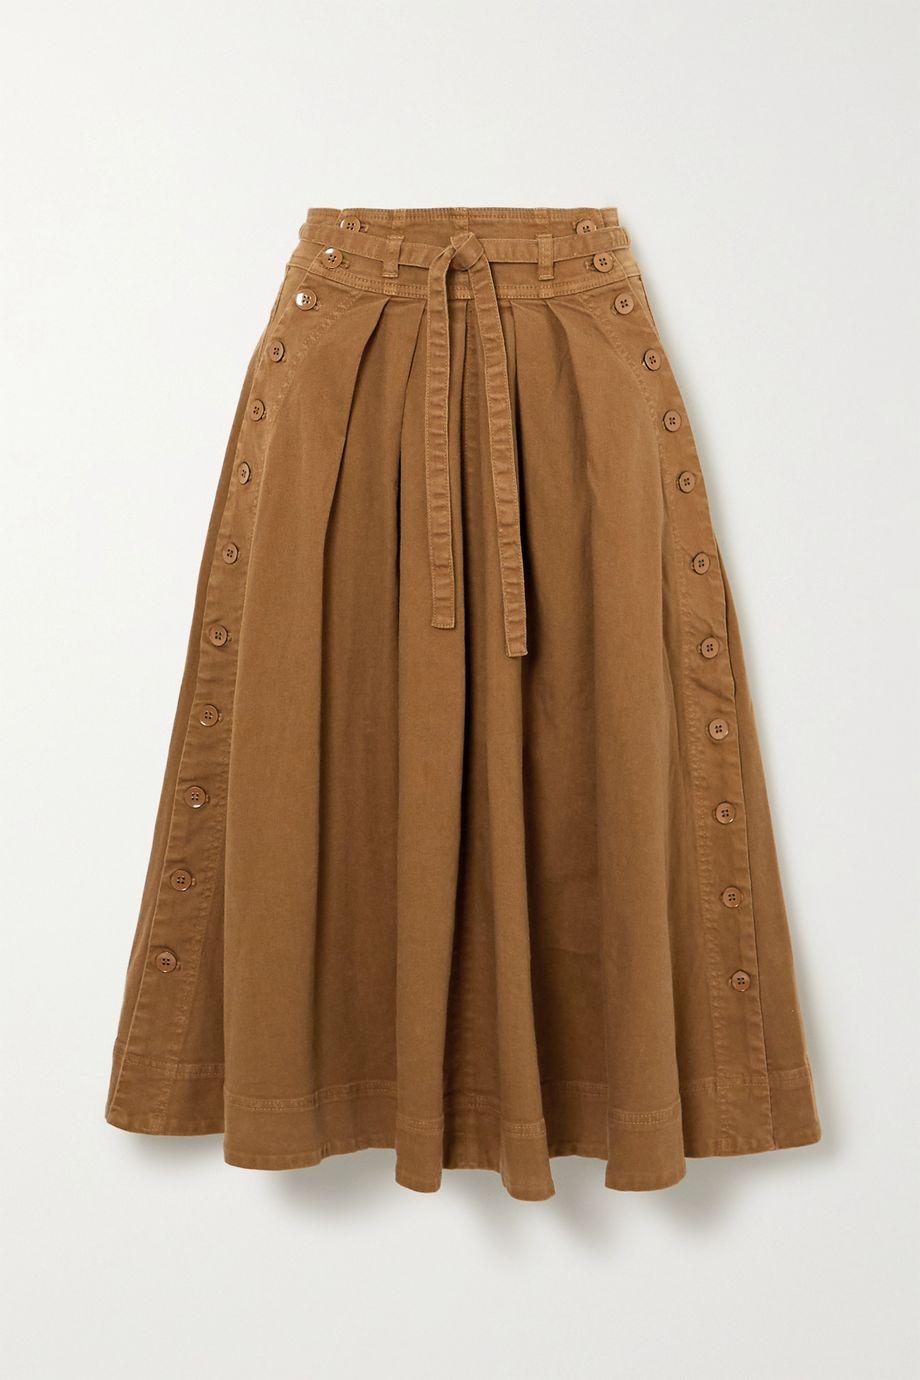 Ulla Johnson Micah belted cotton-blend twill midi skirt